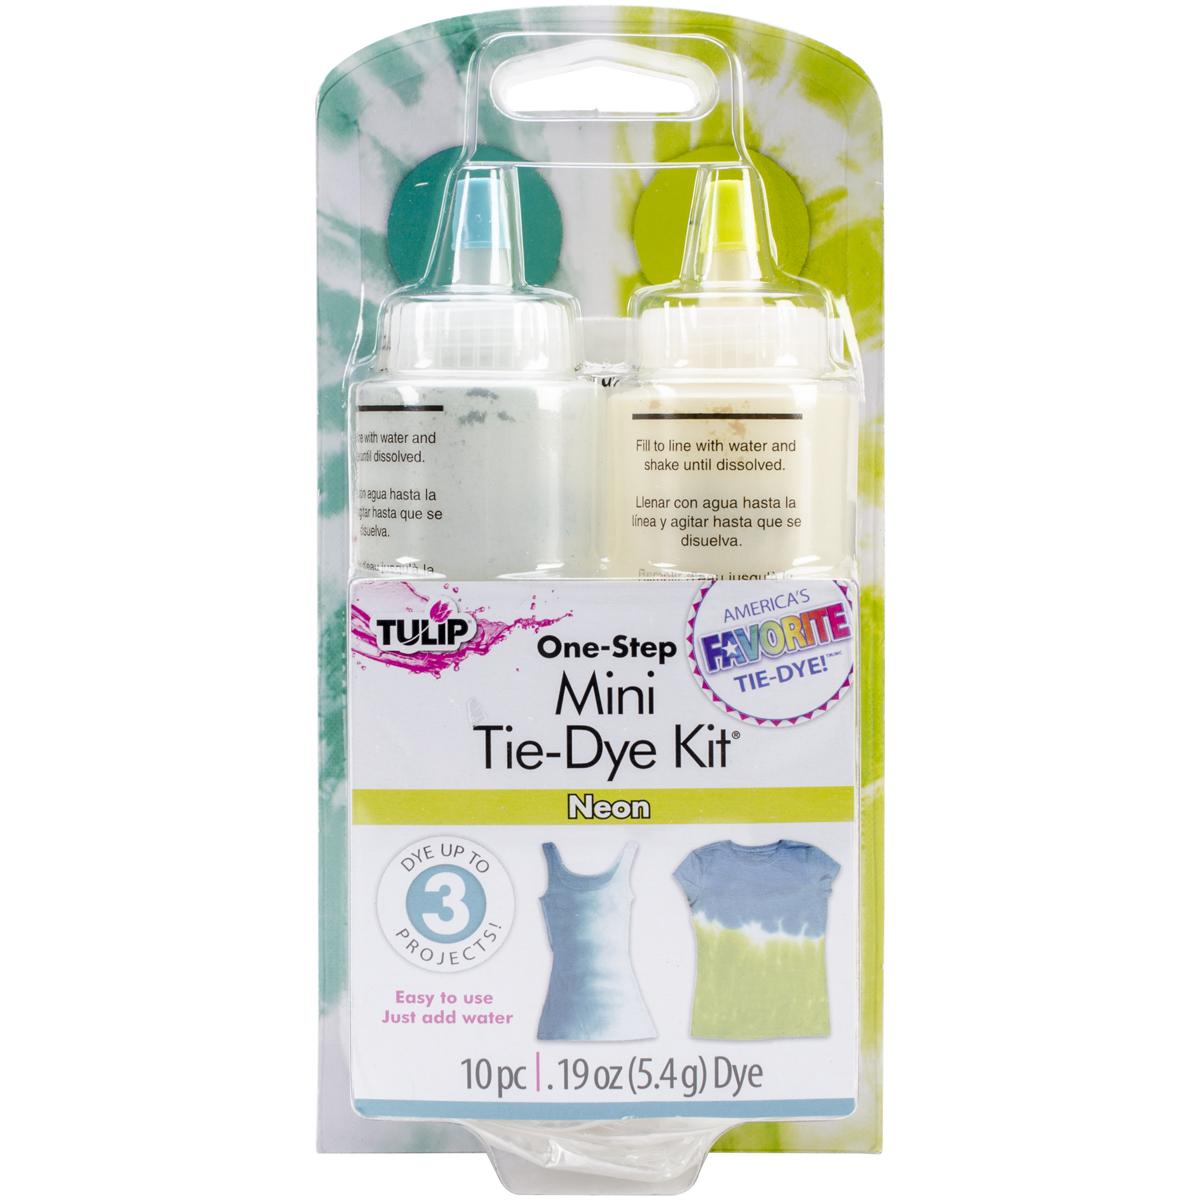 Tulip One-Step Mini Tie-Dye Kit-Neon